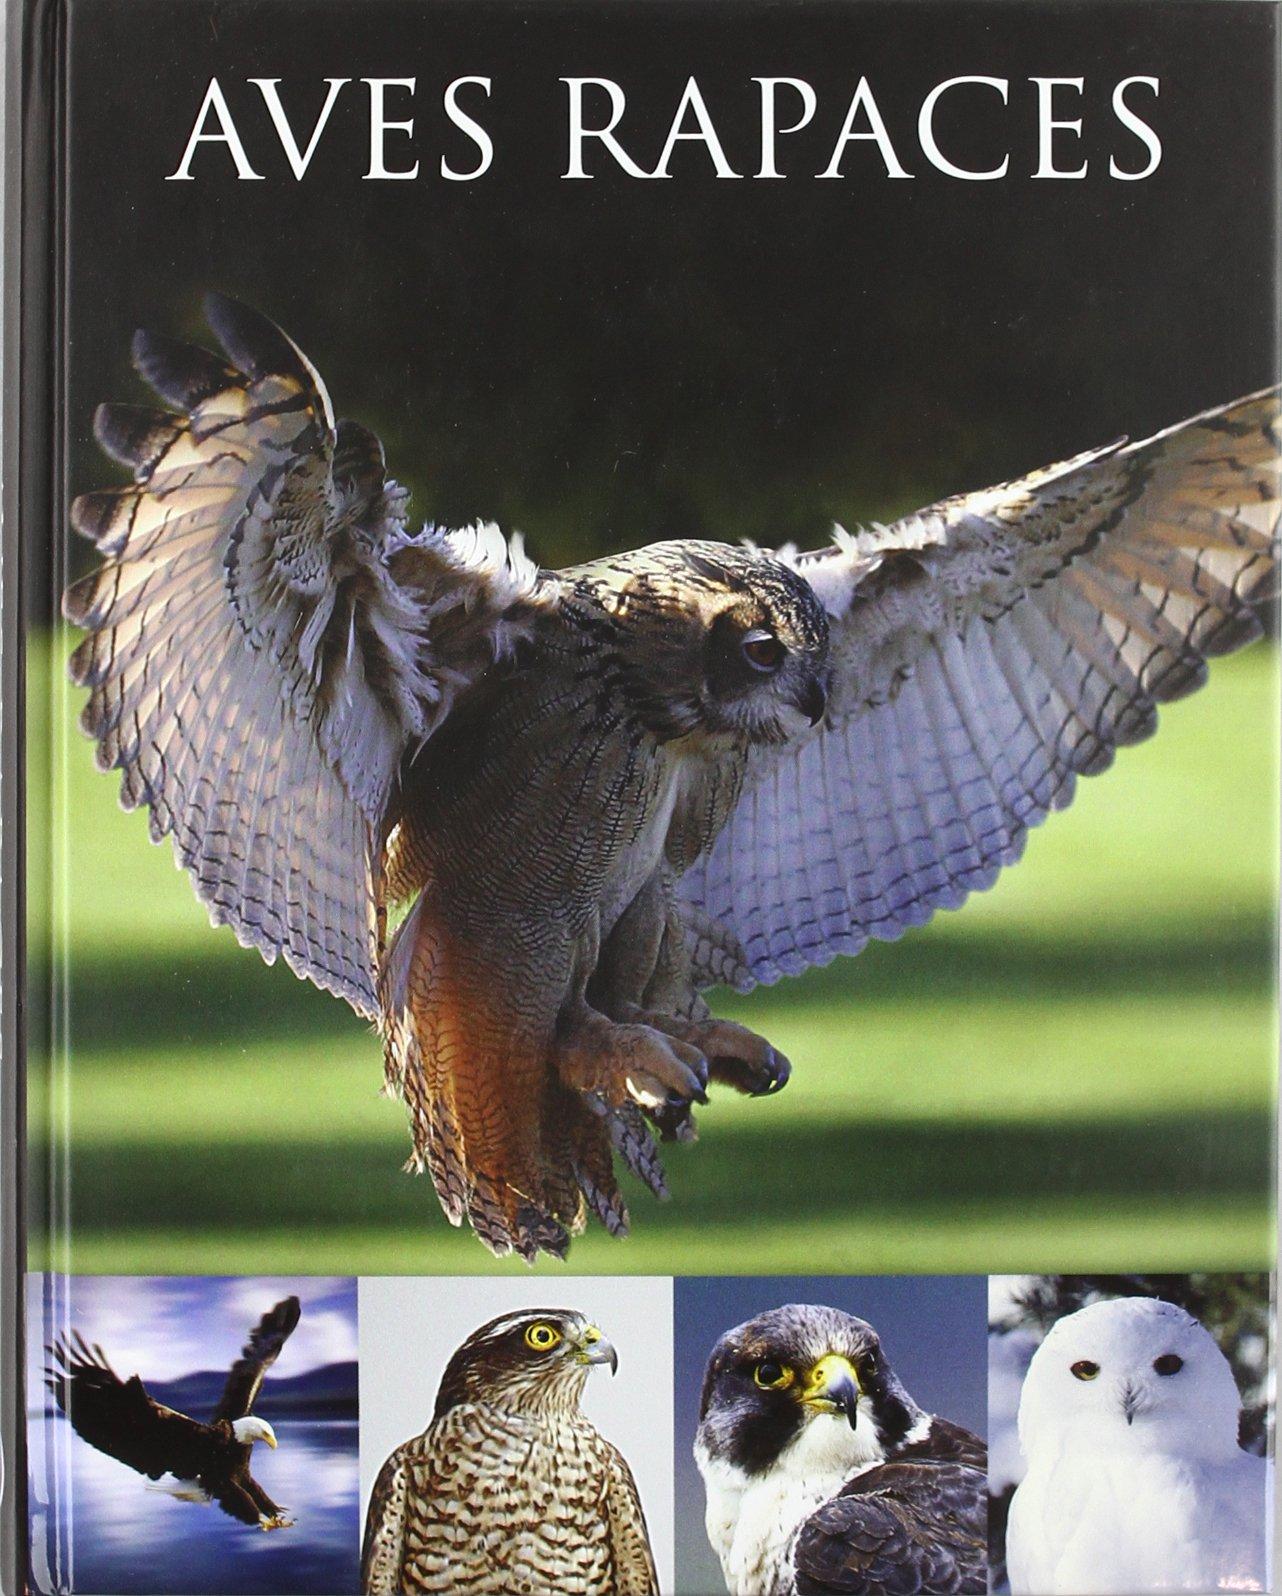 Aves rapaces: Amazon.es: Frost, Paul: Libros